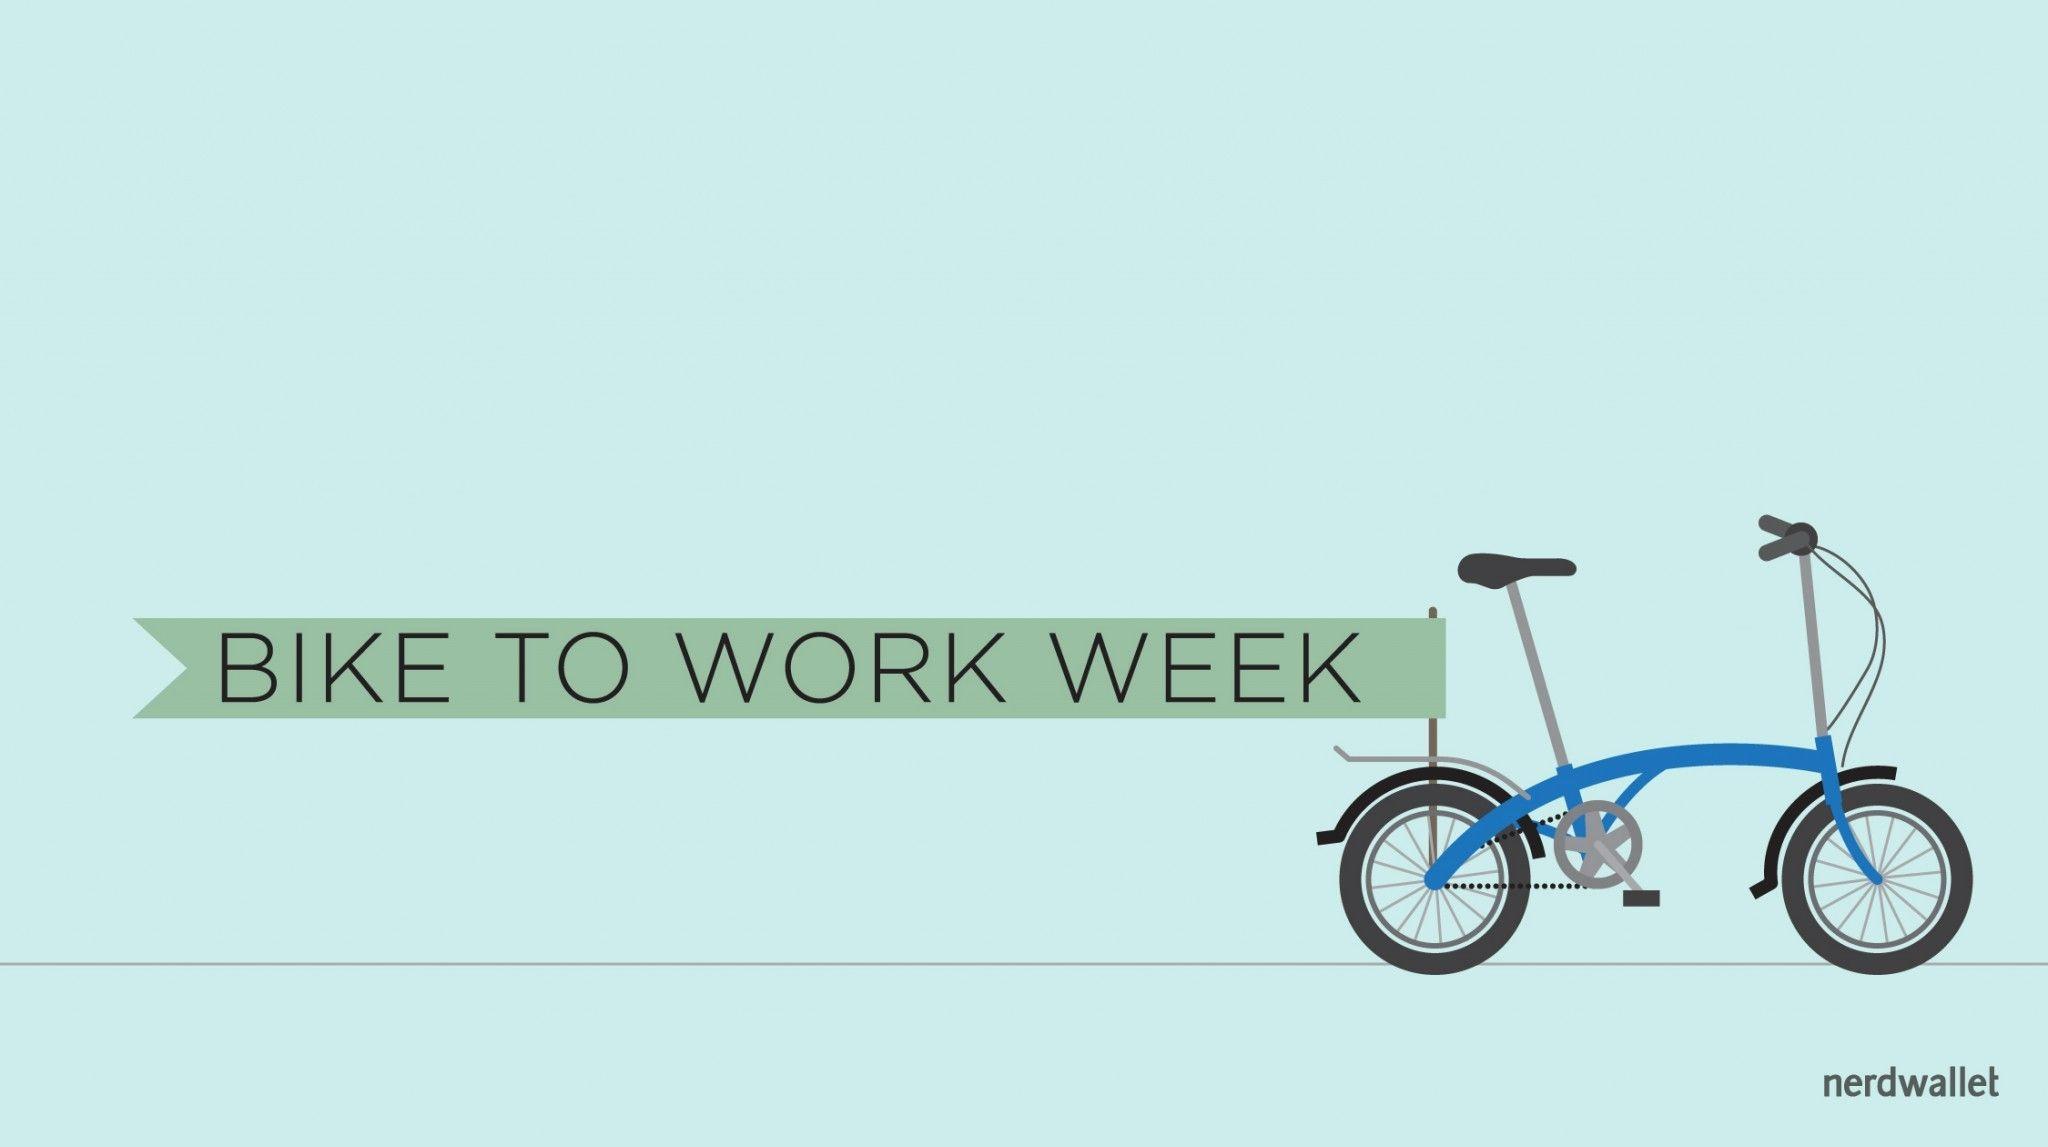 Bike To Work Week Bicycling And The Best Bike Ideas